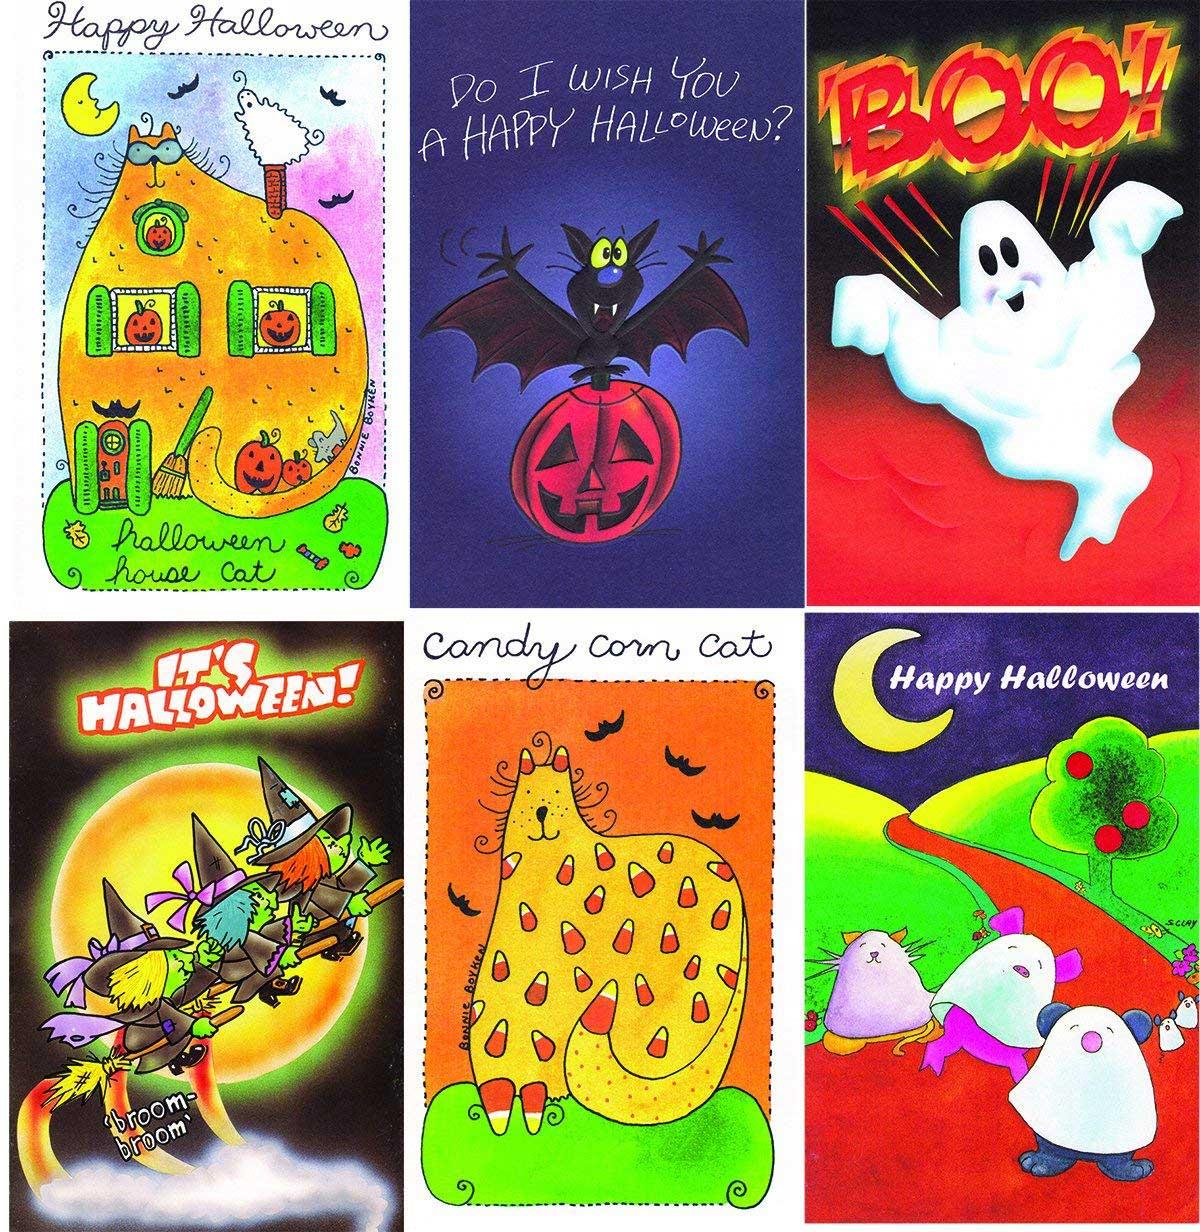 60 Assorted General Halloween Cards